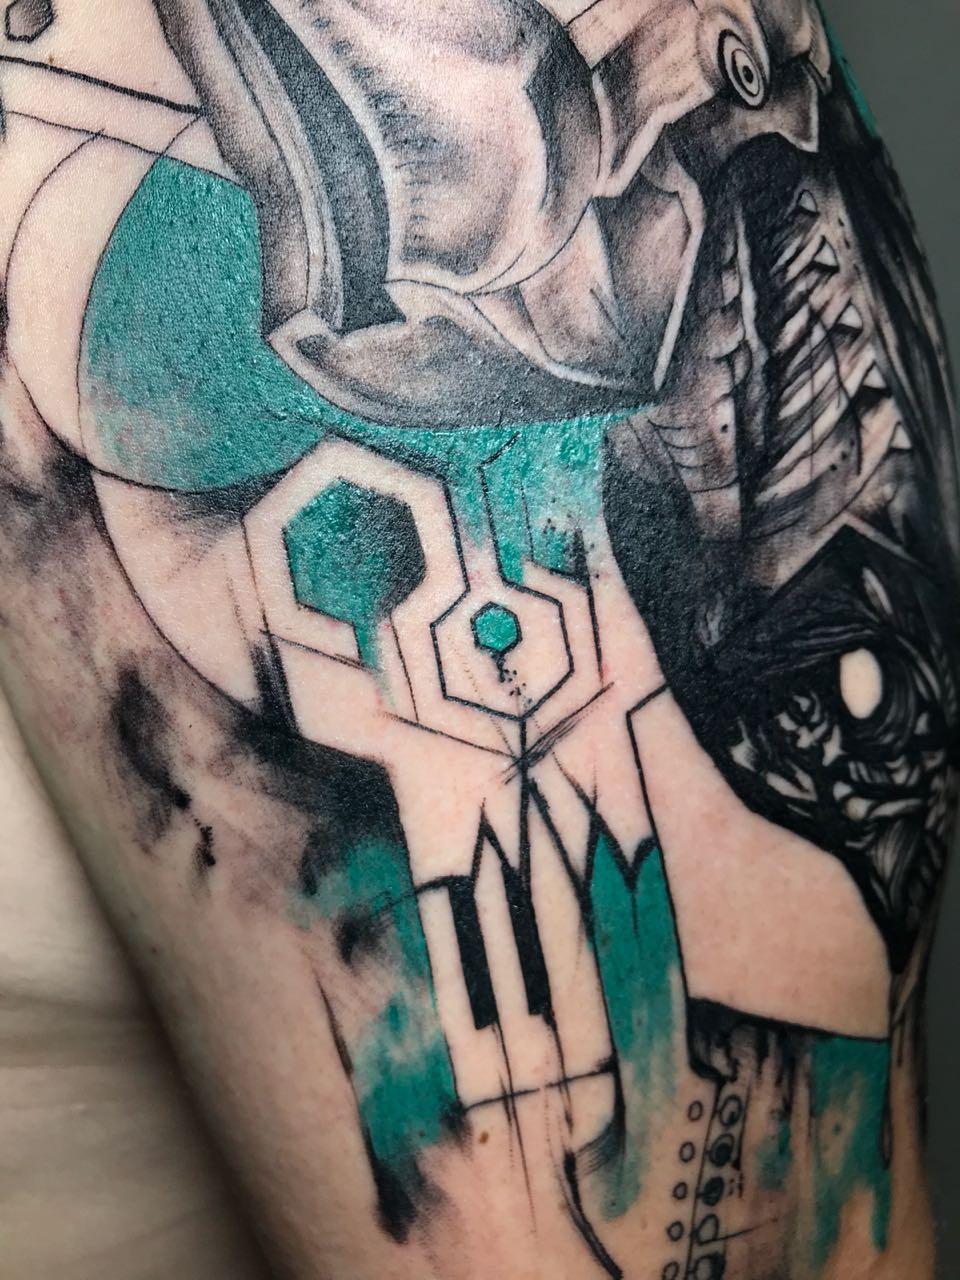 Lou_Tattoo_18.jpg